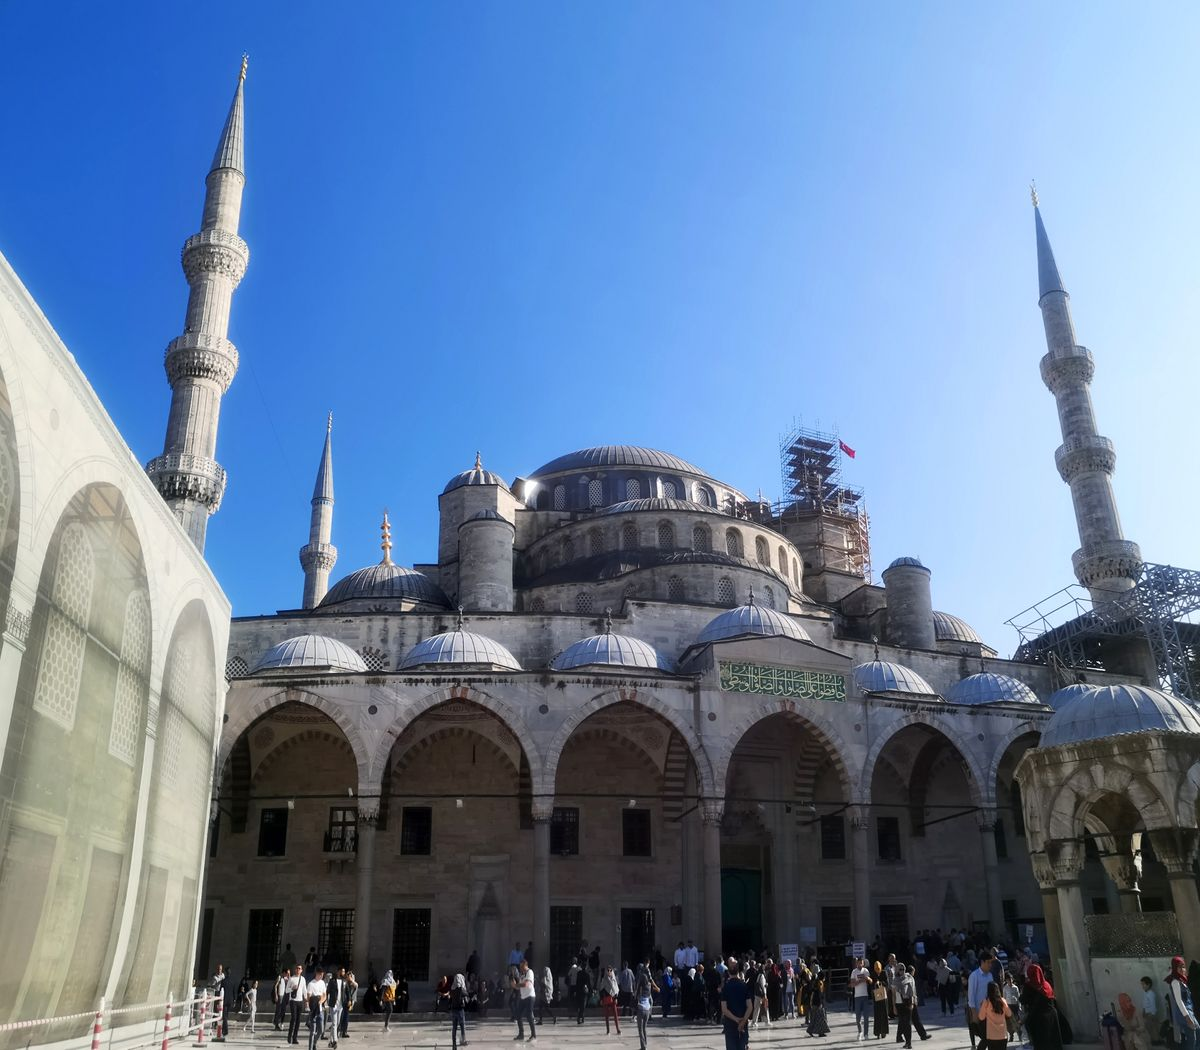 Kek-mecset